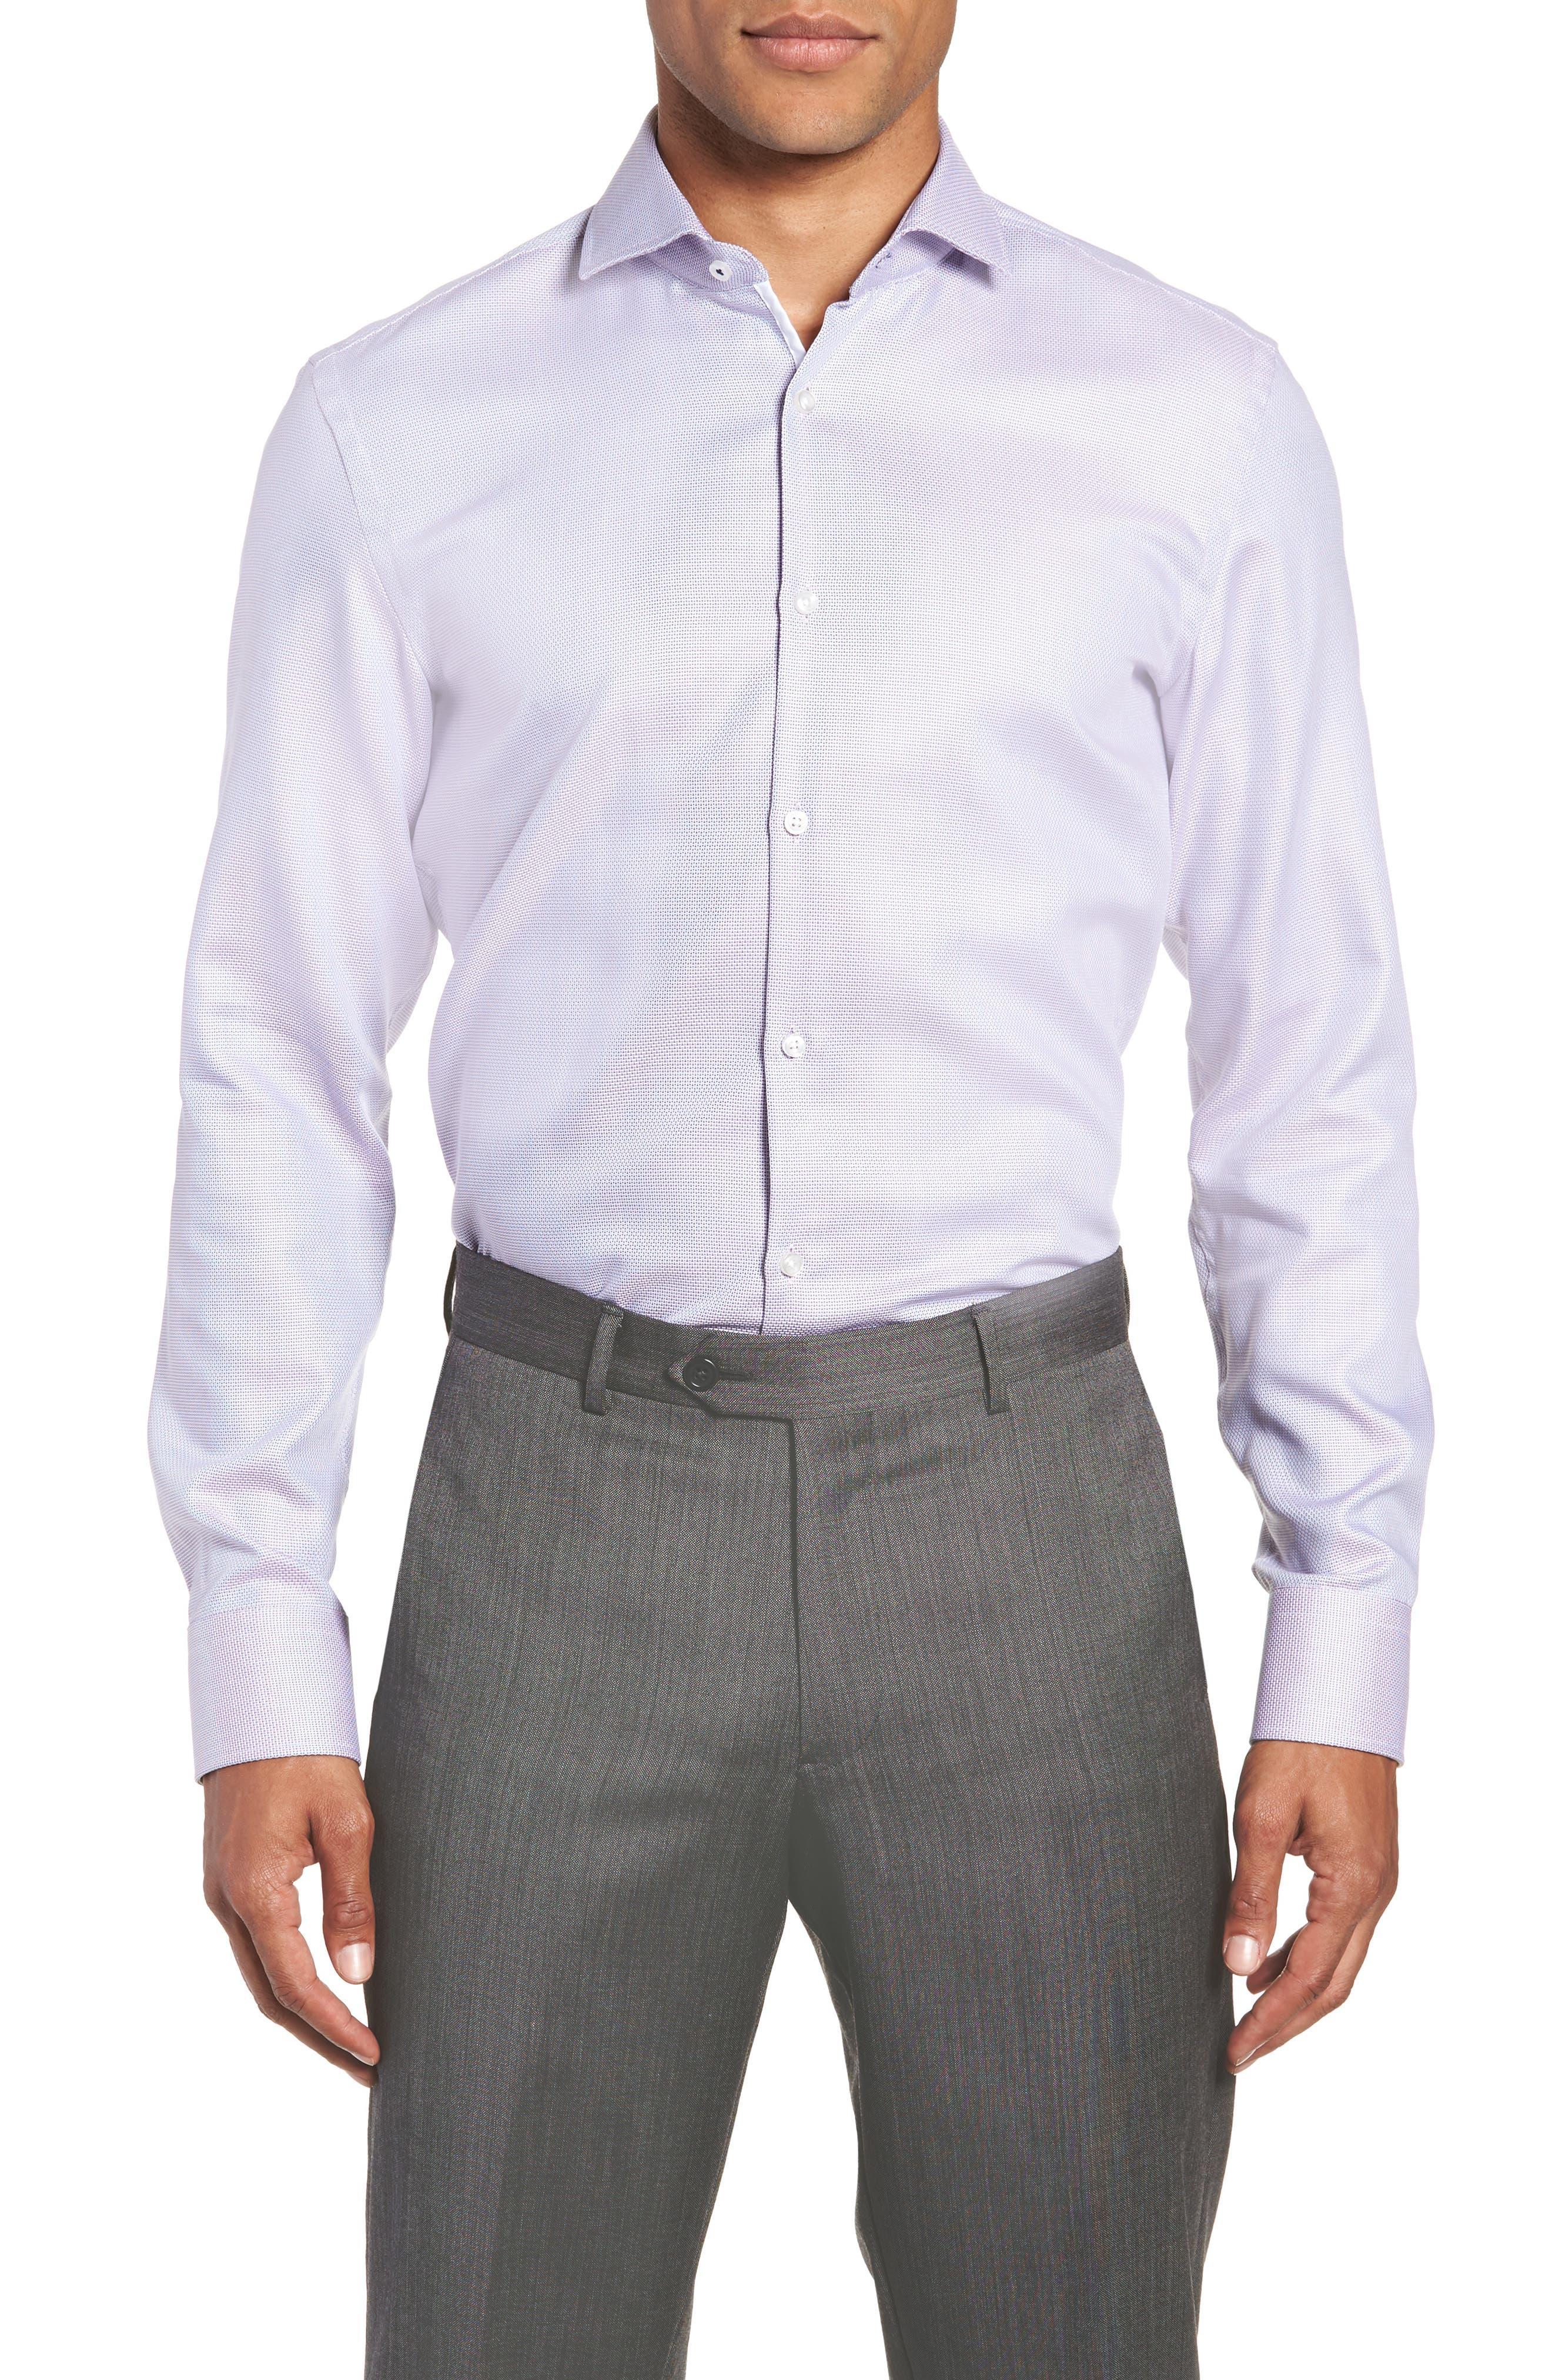 x Nordstrom Jerrin Slim Fit Solid Dress Shirt,                             Main thumbnail 1, color,                             LAVENDER